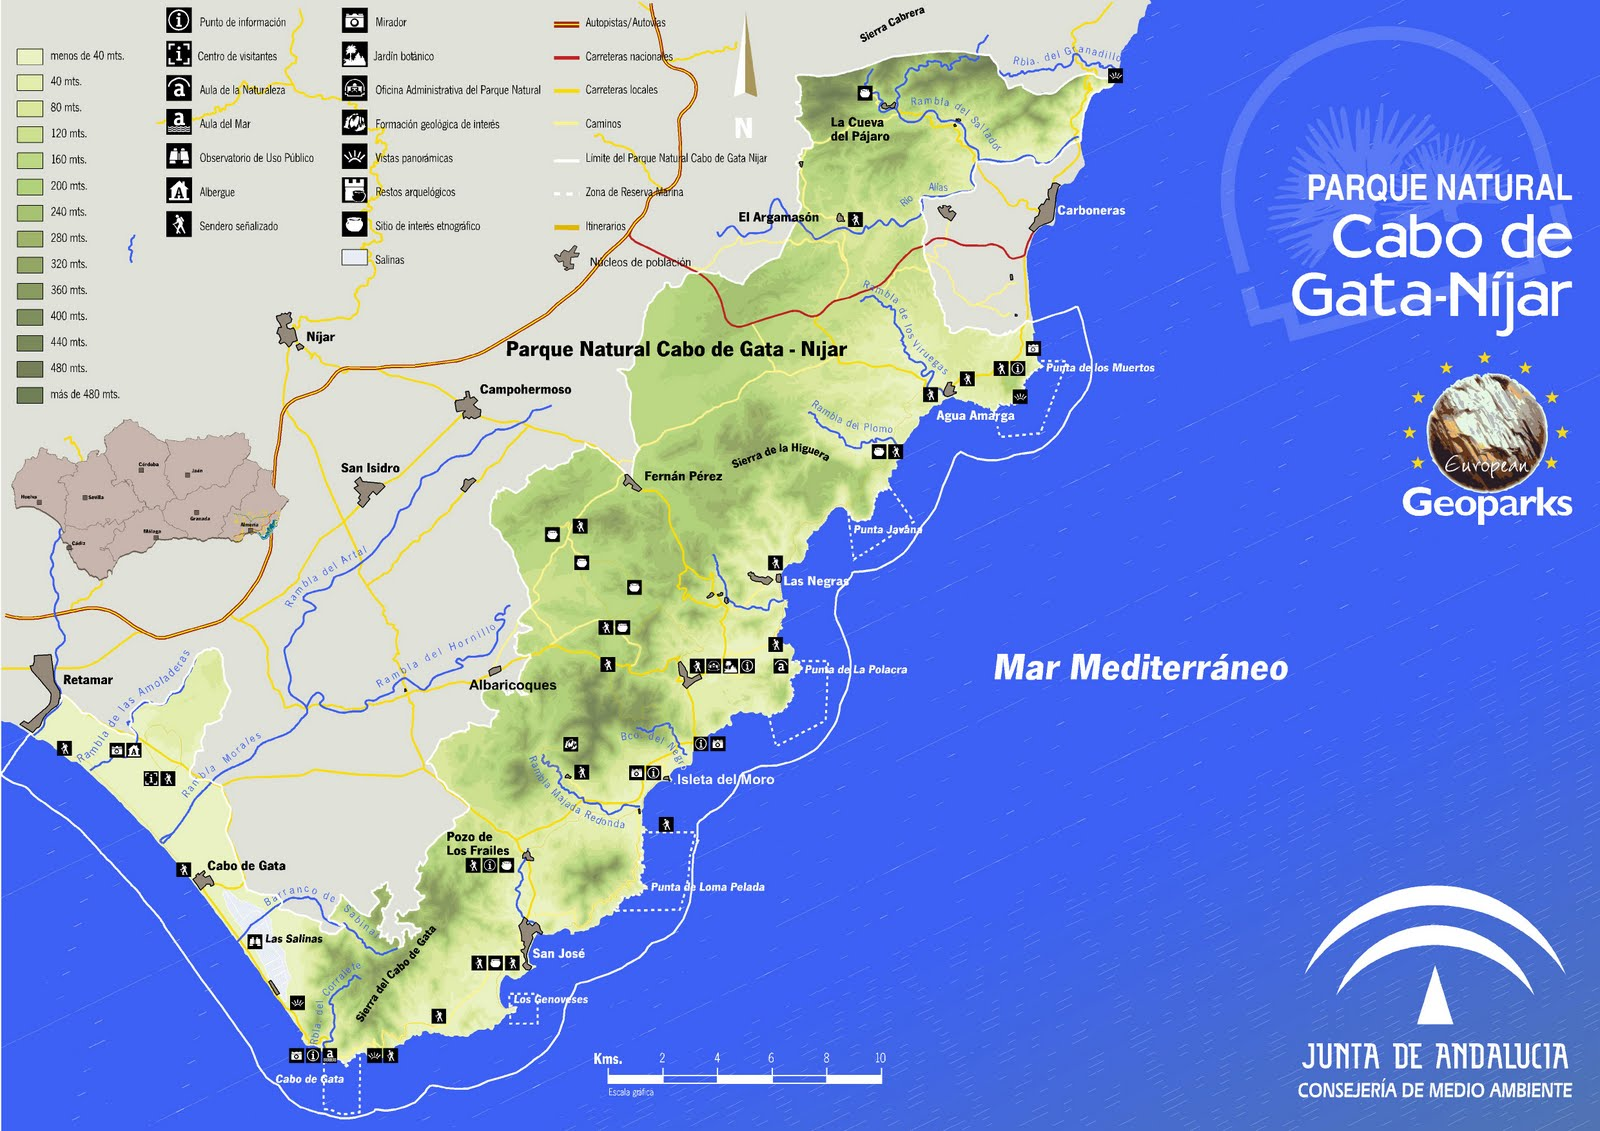 Parque natural cabo de gata n jar almer a mapa principal cabo de gata - Parque natural cabo de gata nijar ...